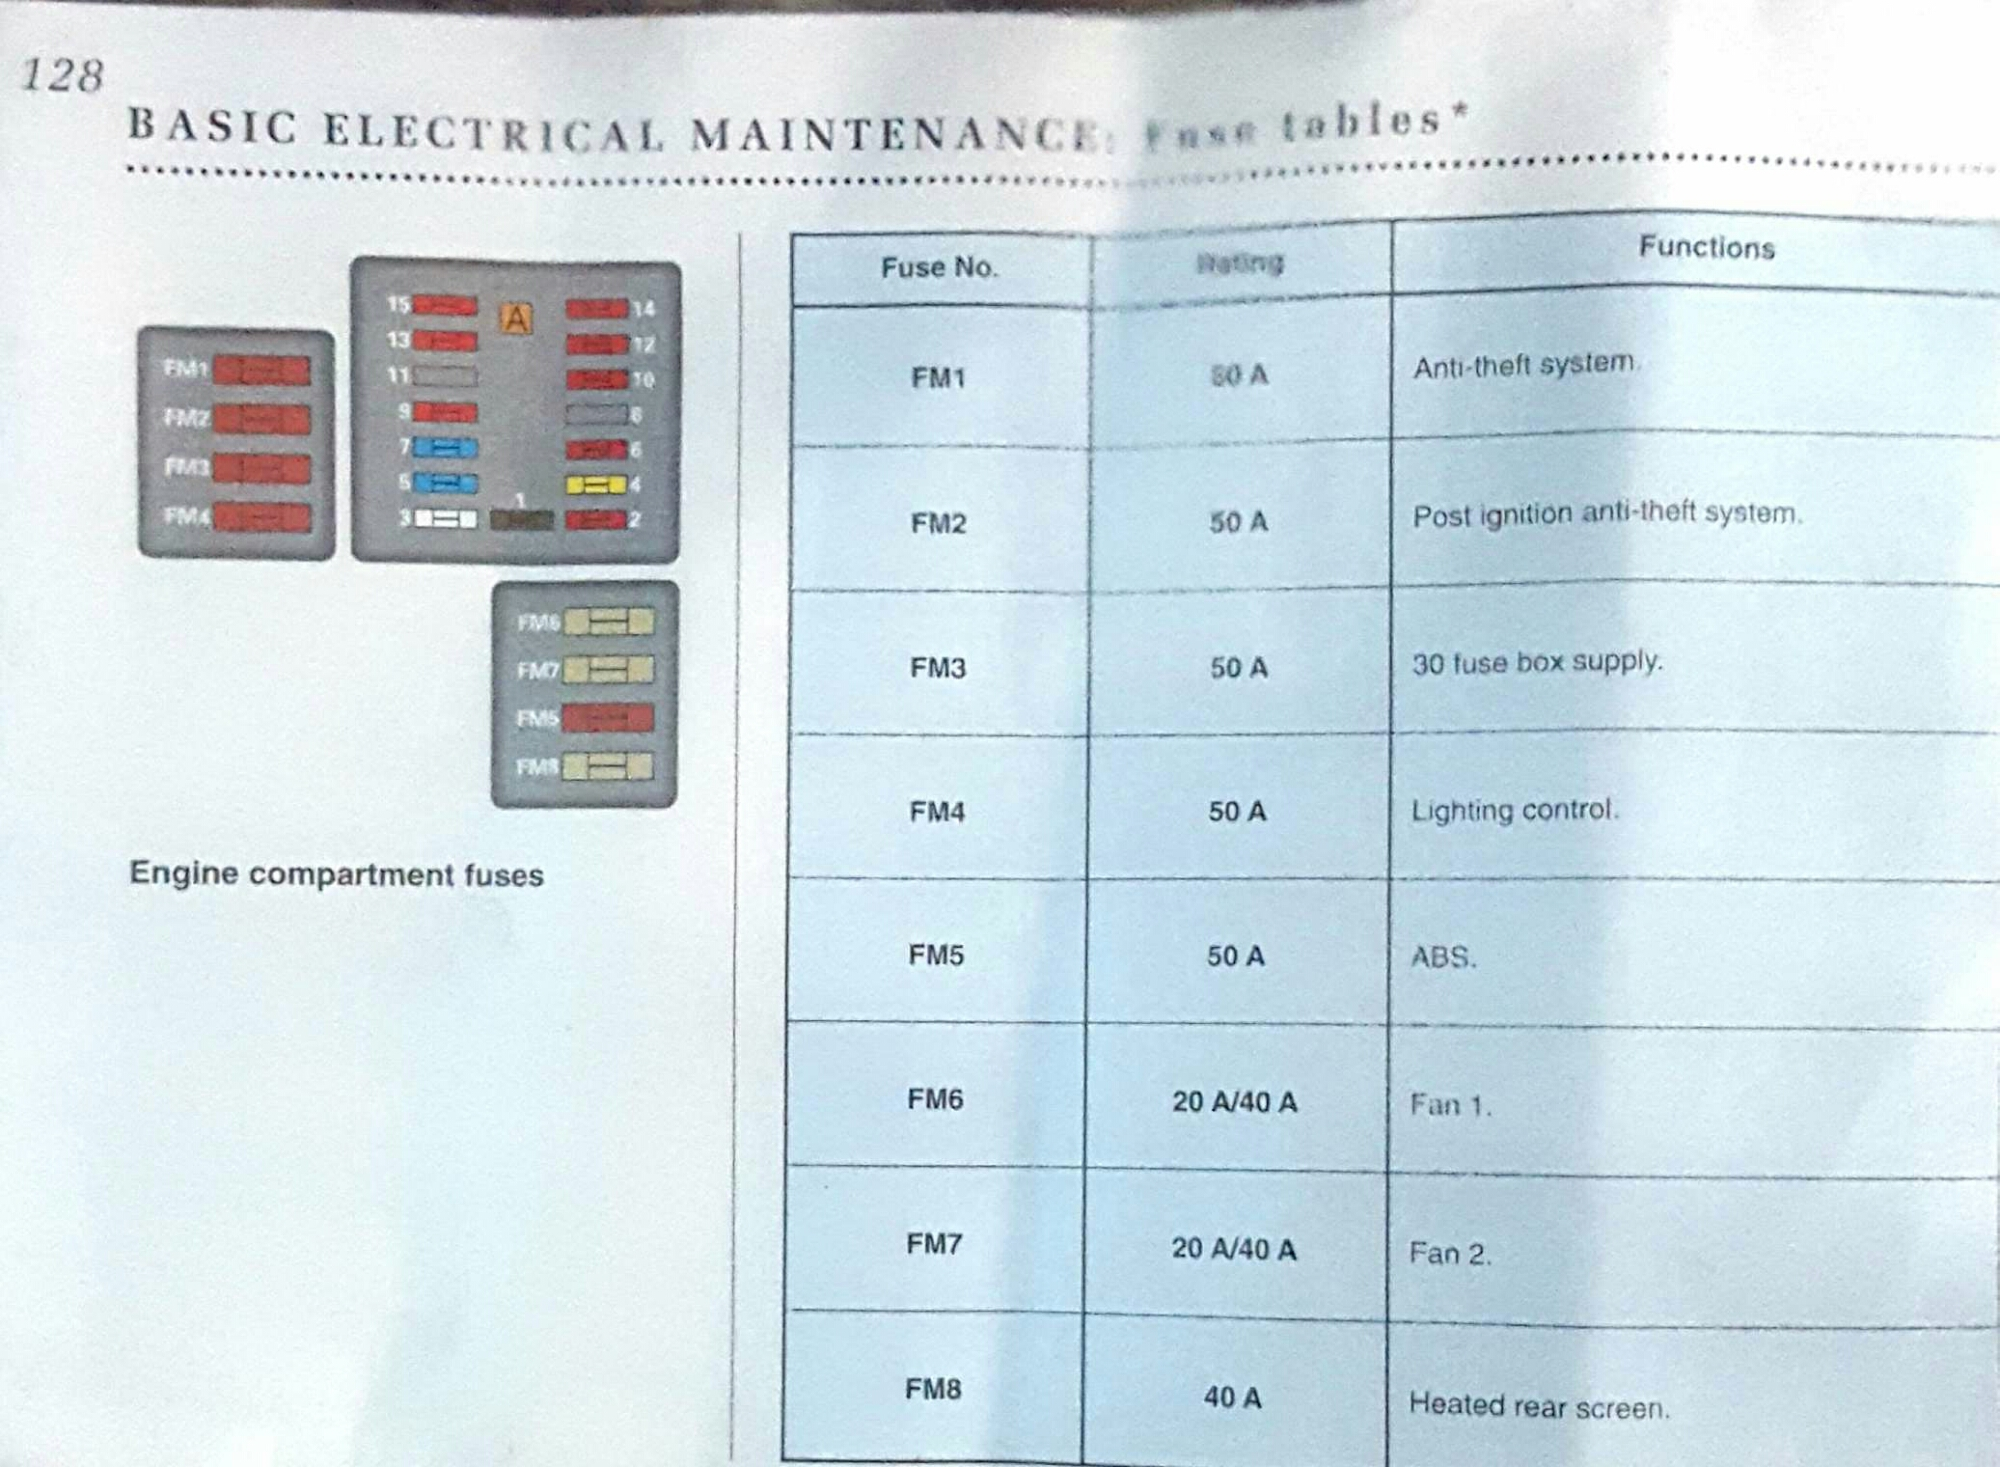 citroen c5 suspension pump wiring diagram 700r4 plug fuse box in peugeot 106 library